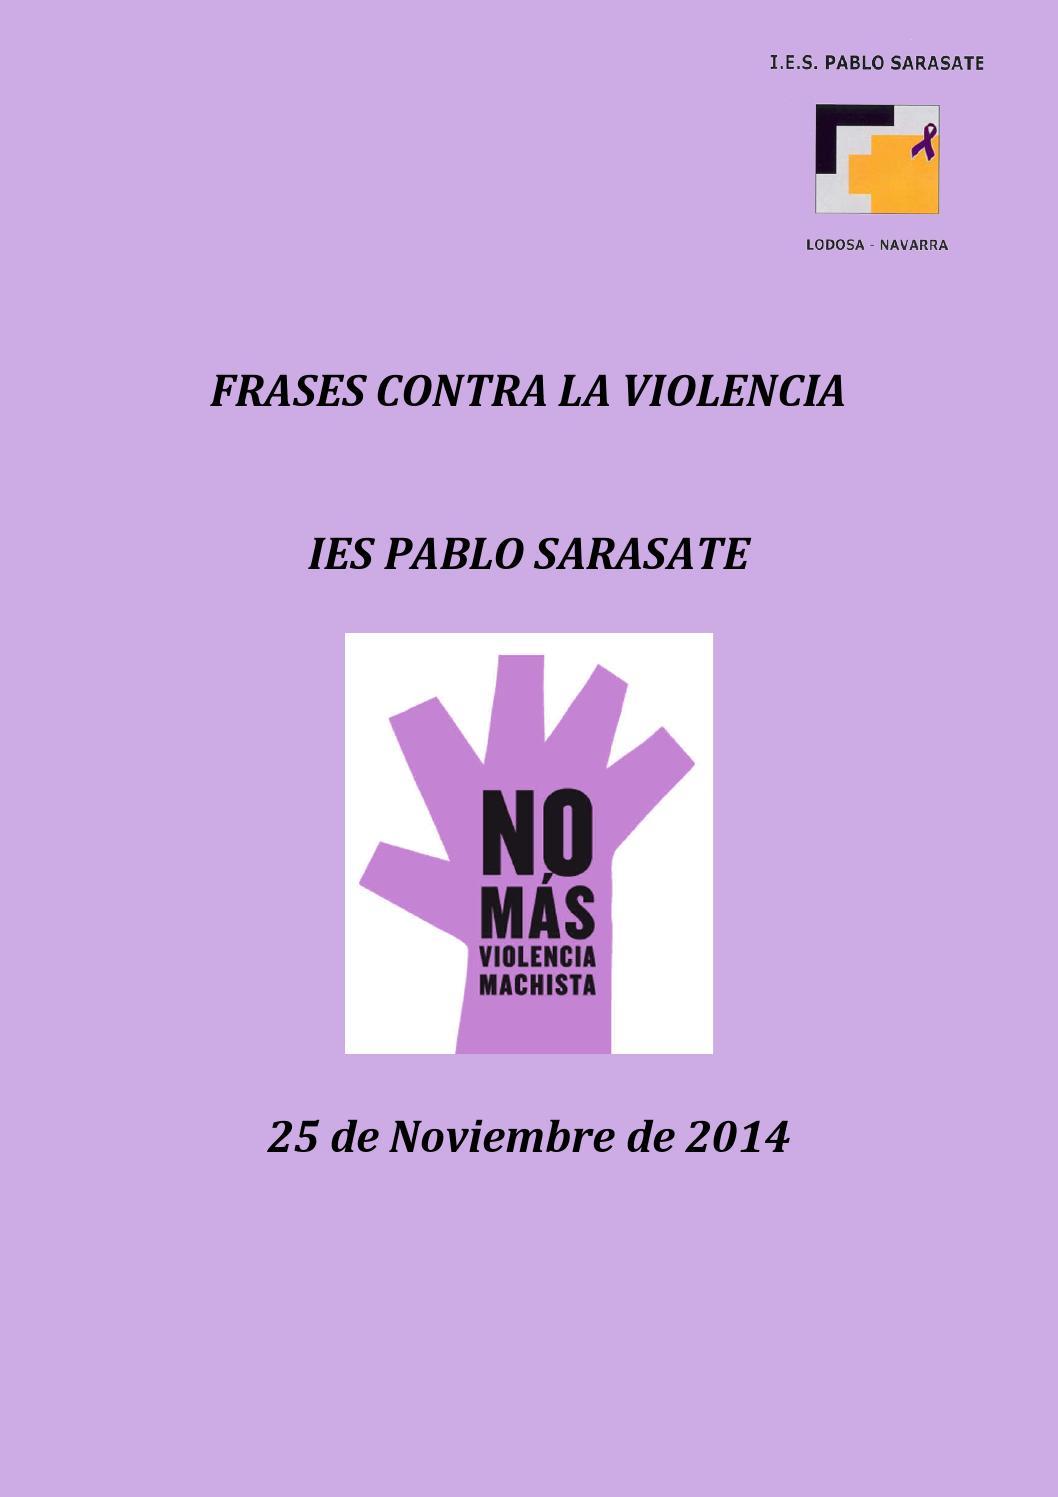 Frases Contra La Violencia By Iespablosarasate Issuu